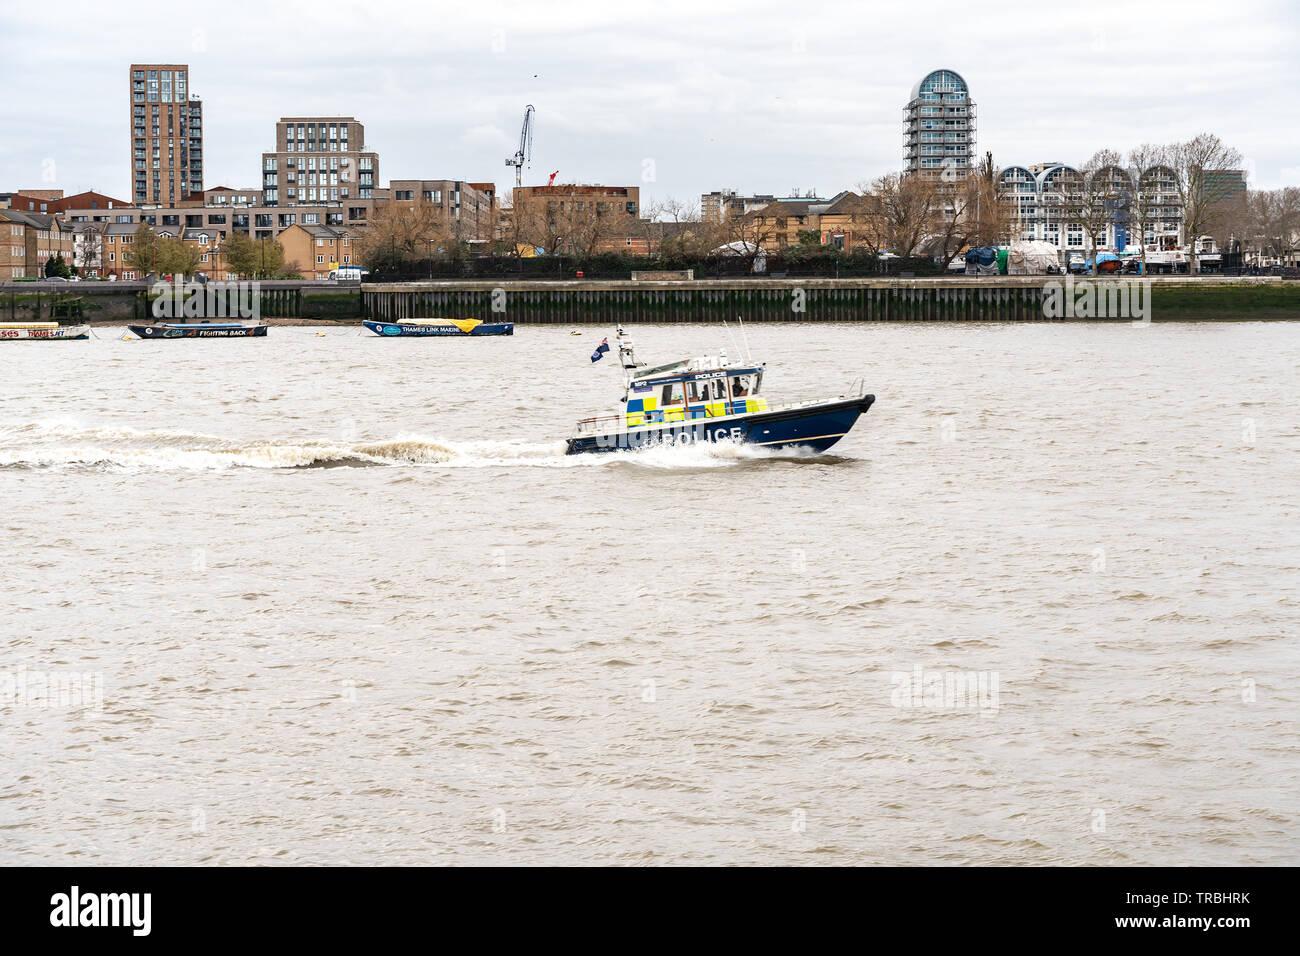 London, UK - March 05, 2019: Police marine patrol boat River Thames London England Uk - Stock Image